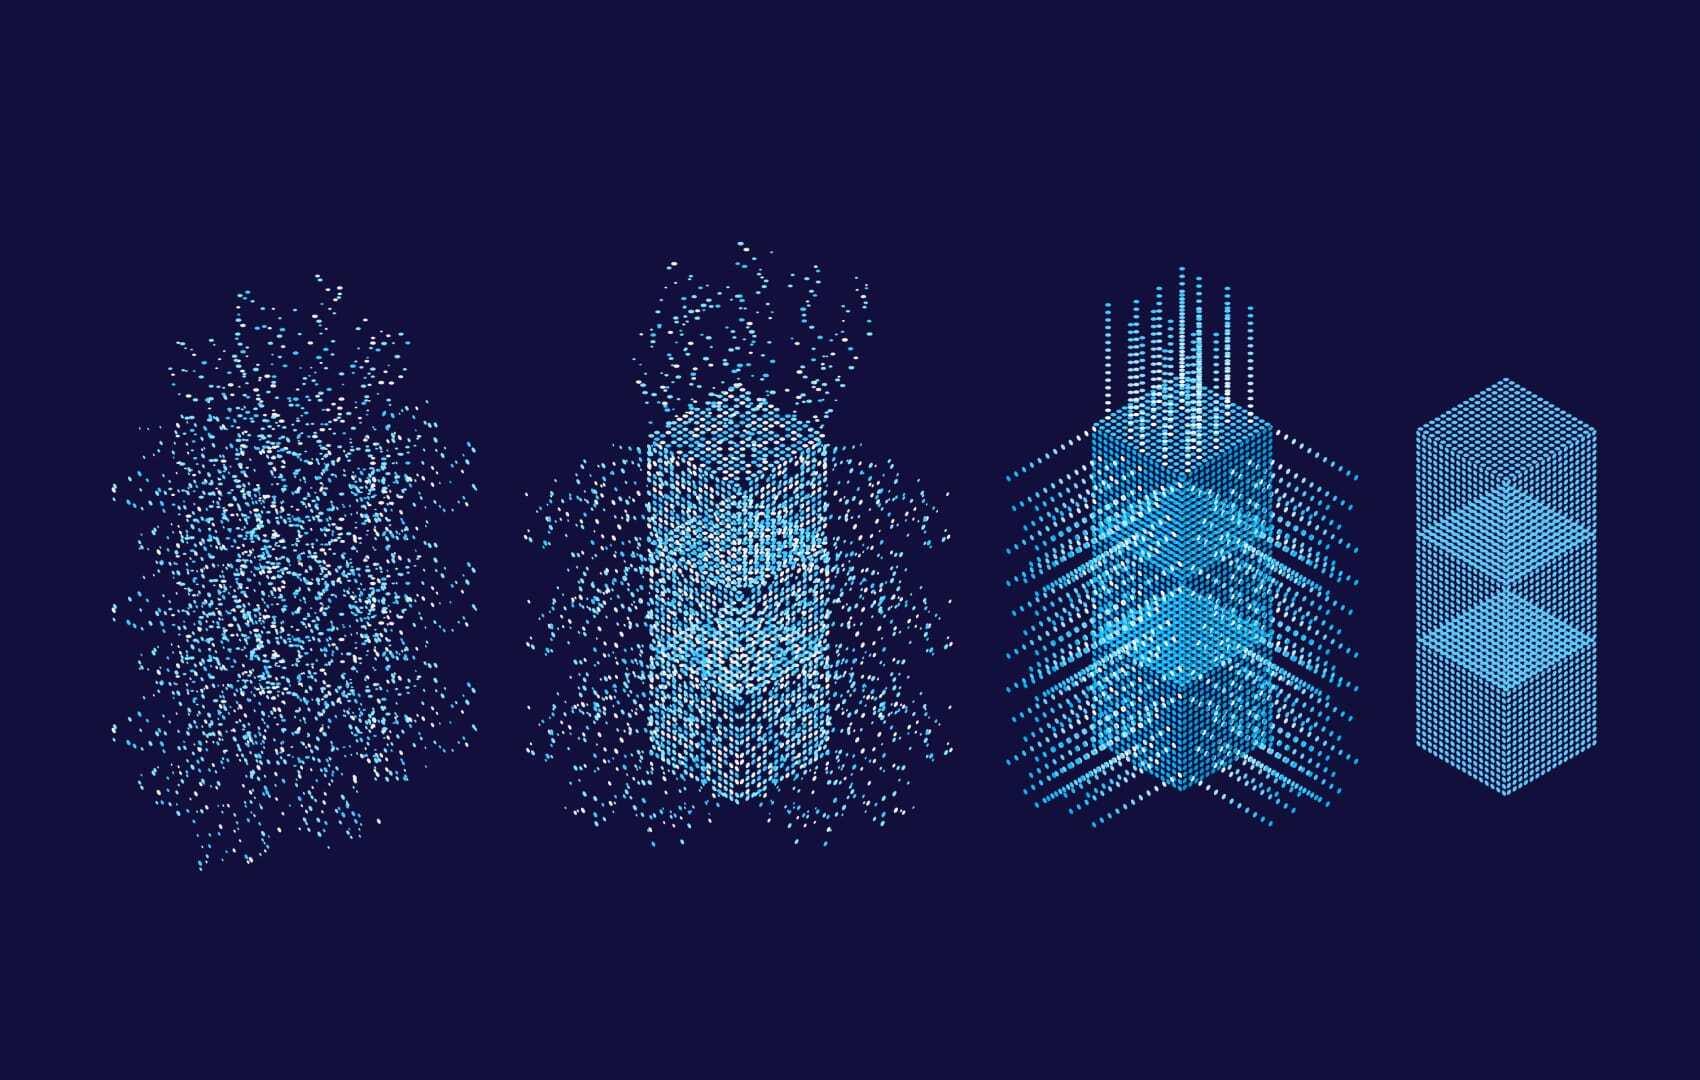 Top 5 Benefits of using Big Data 2021